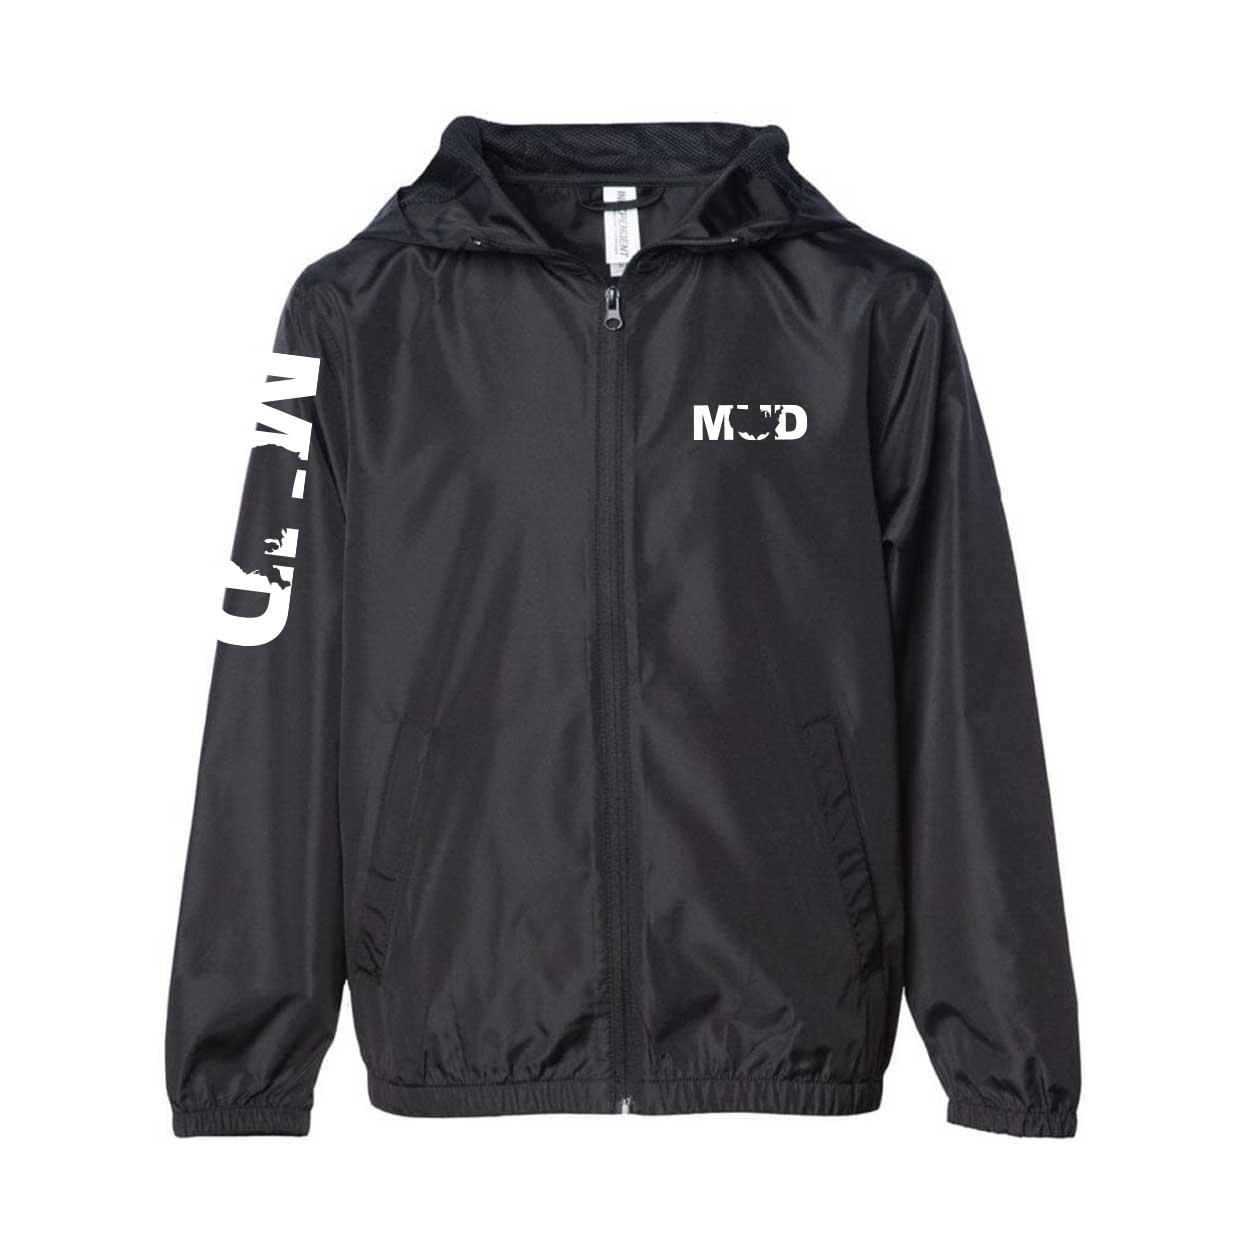 Mud United States Classic Youth Lightweight Windbreaker Black (White Logo)